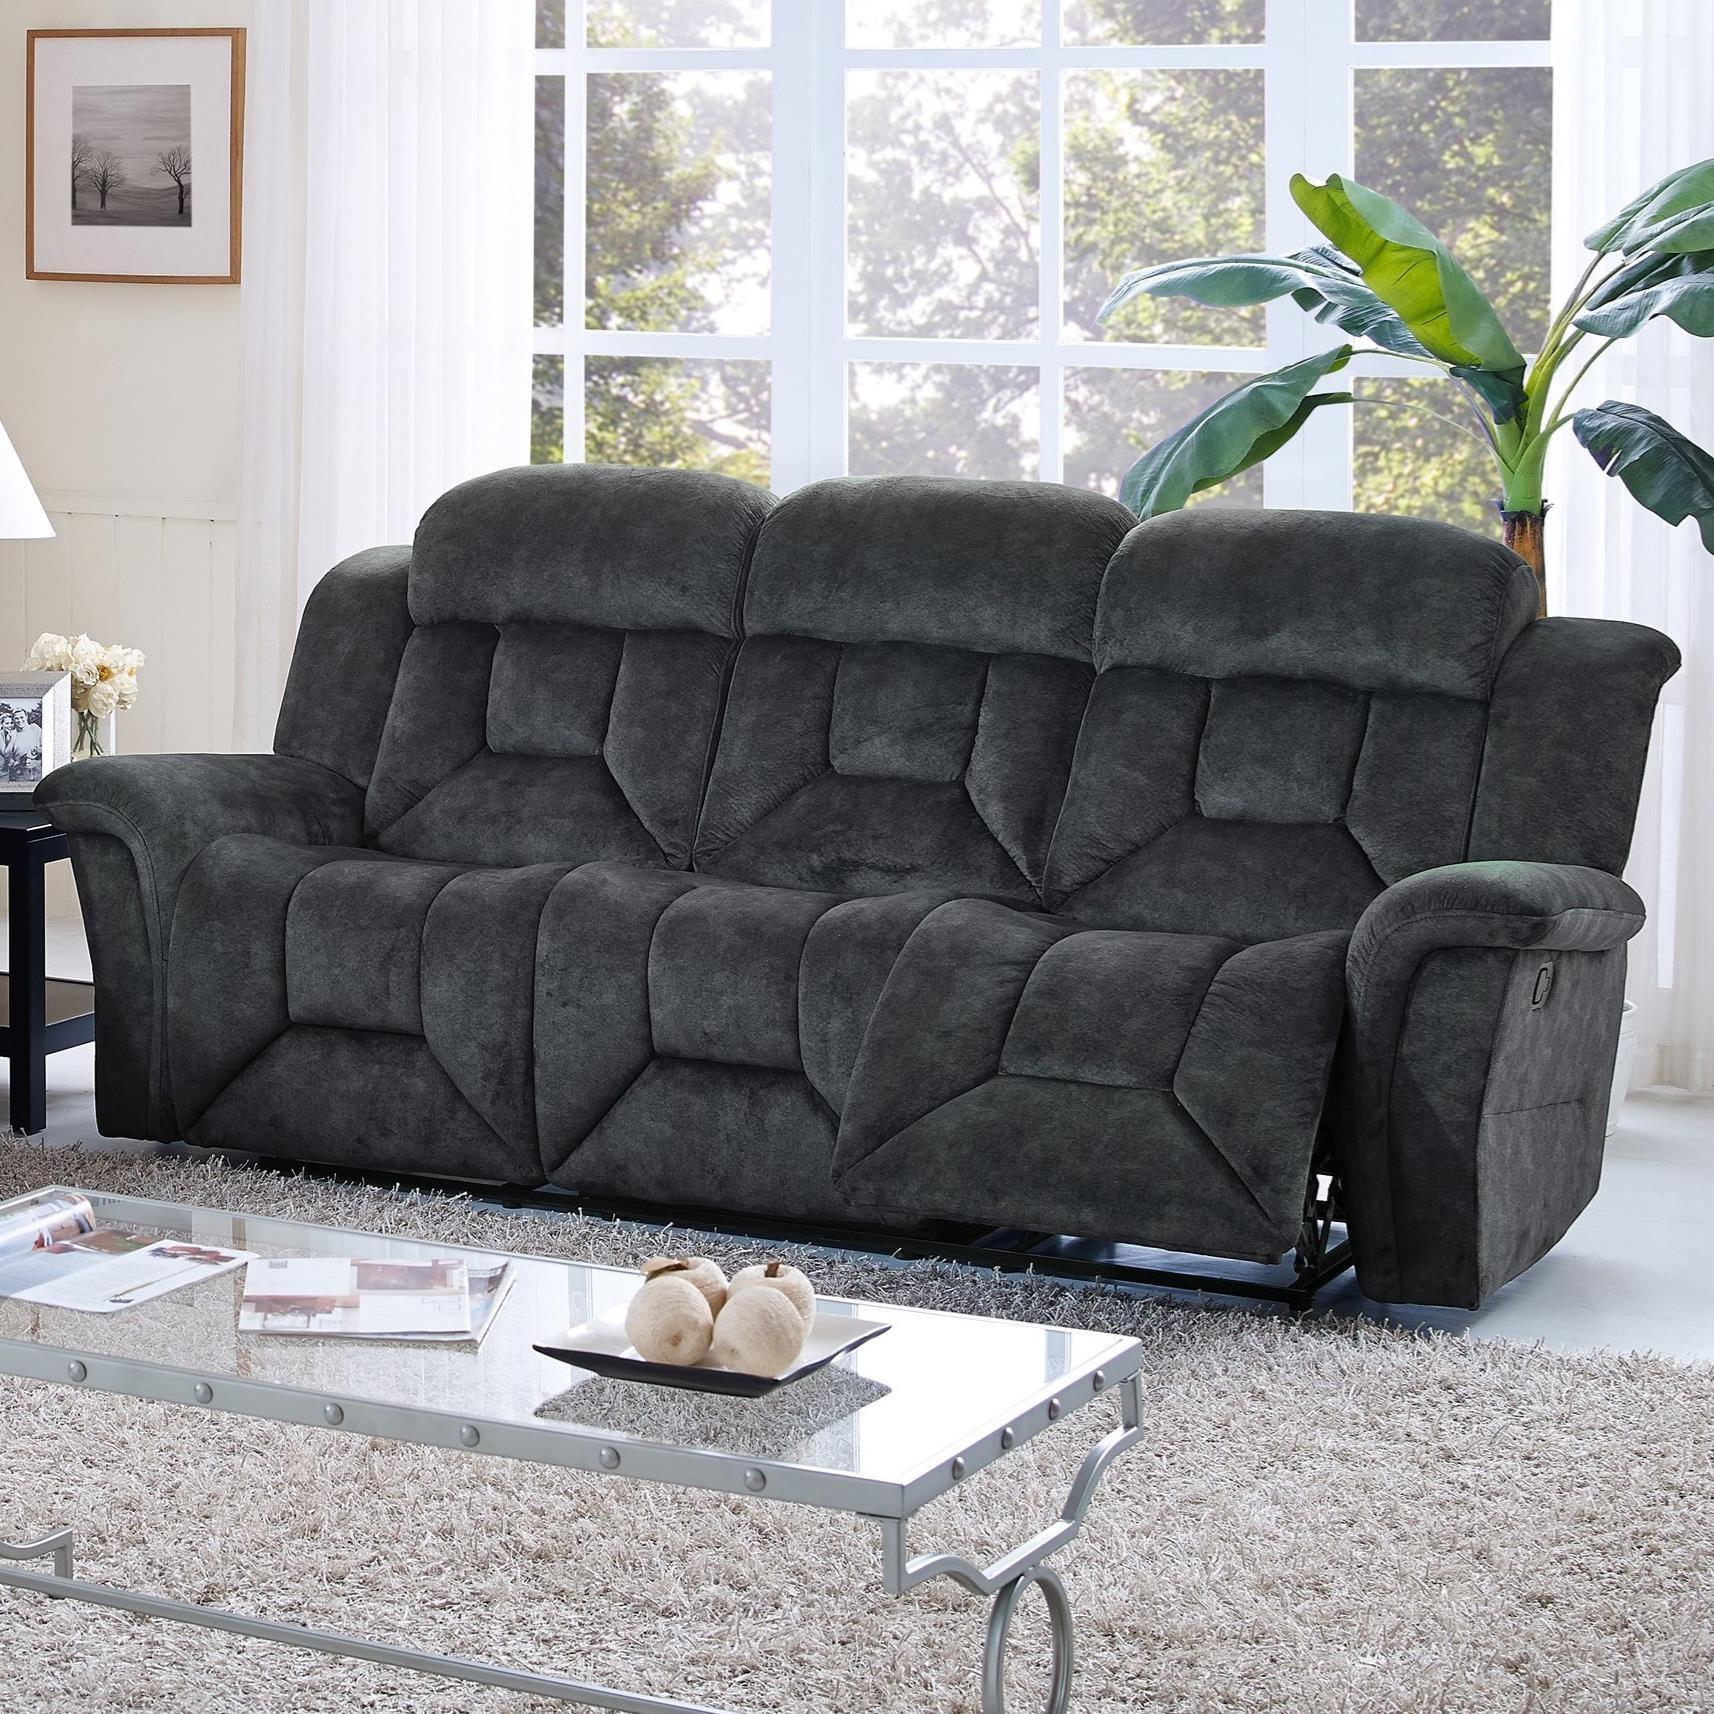 New Classic Jemma Dual Recliner Sofa - Item Number: 20-2191-30-CGY